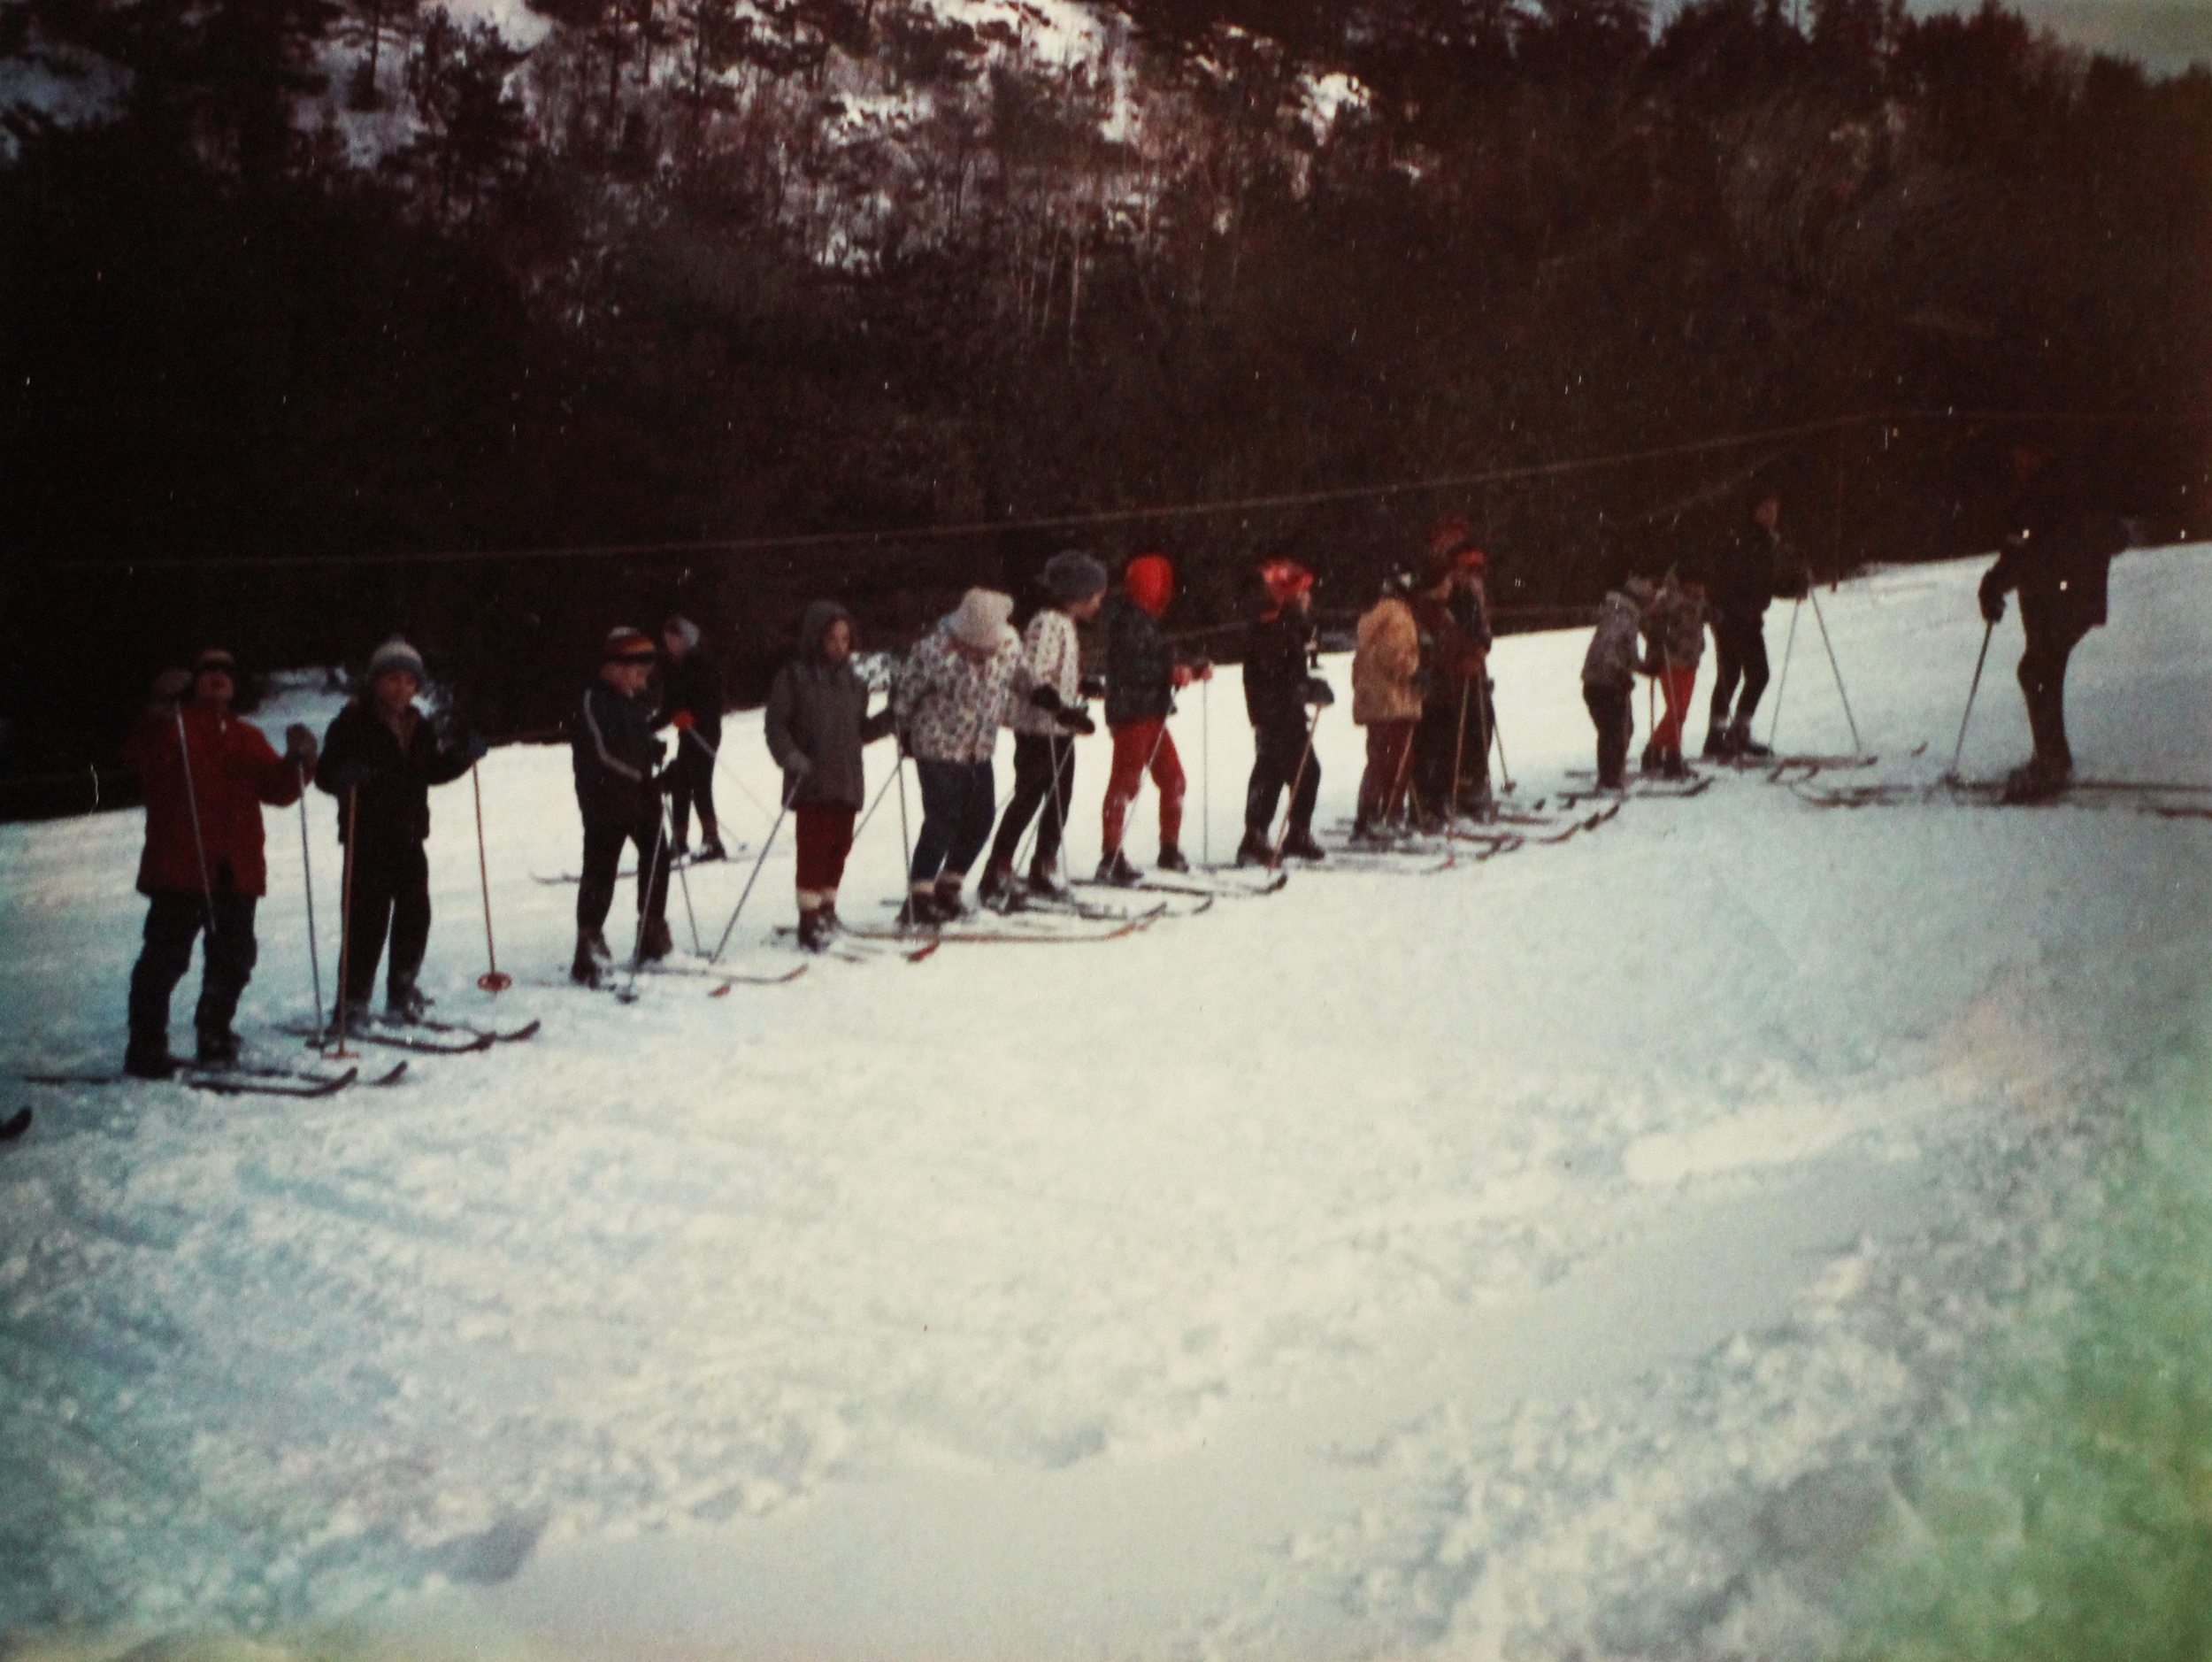 Getting in line at Otis ski hill. Courtesy of Jeff Alott.